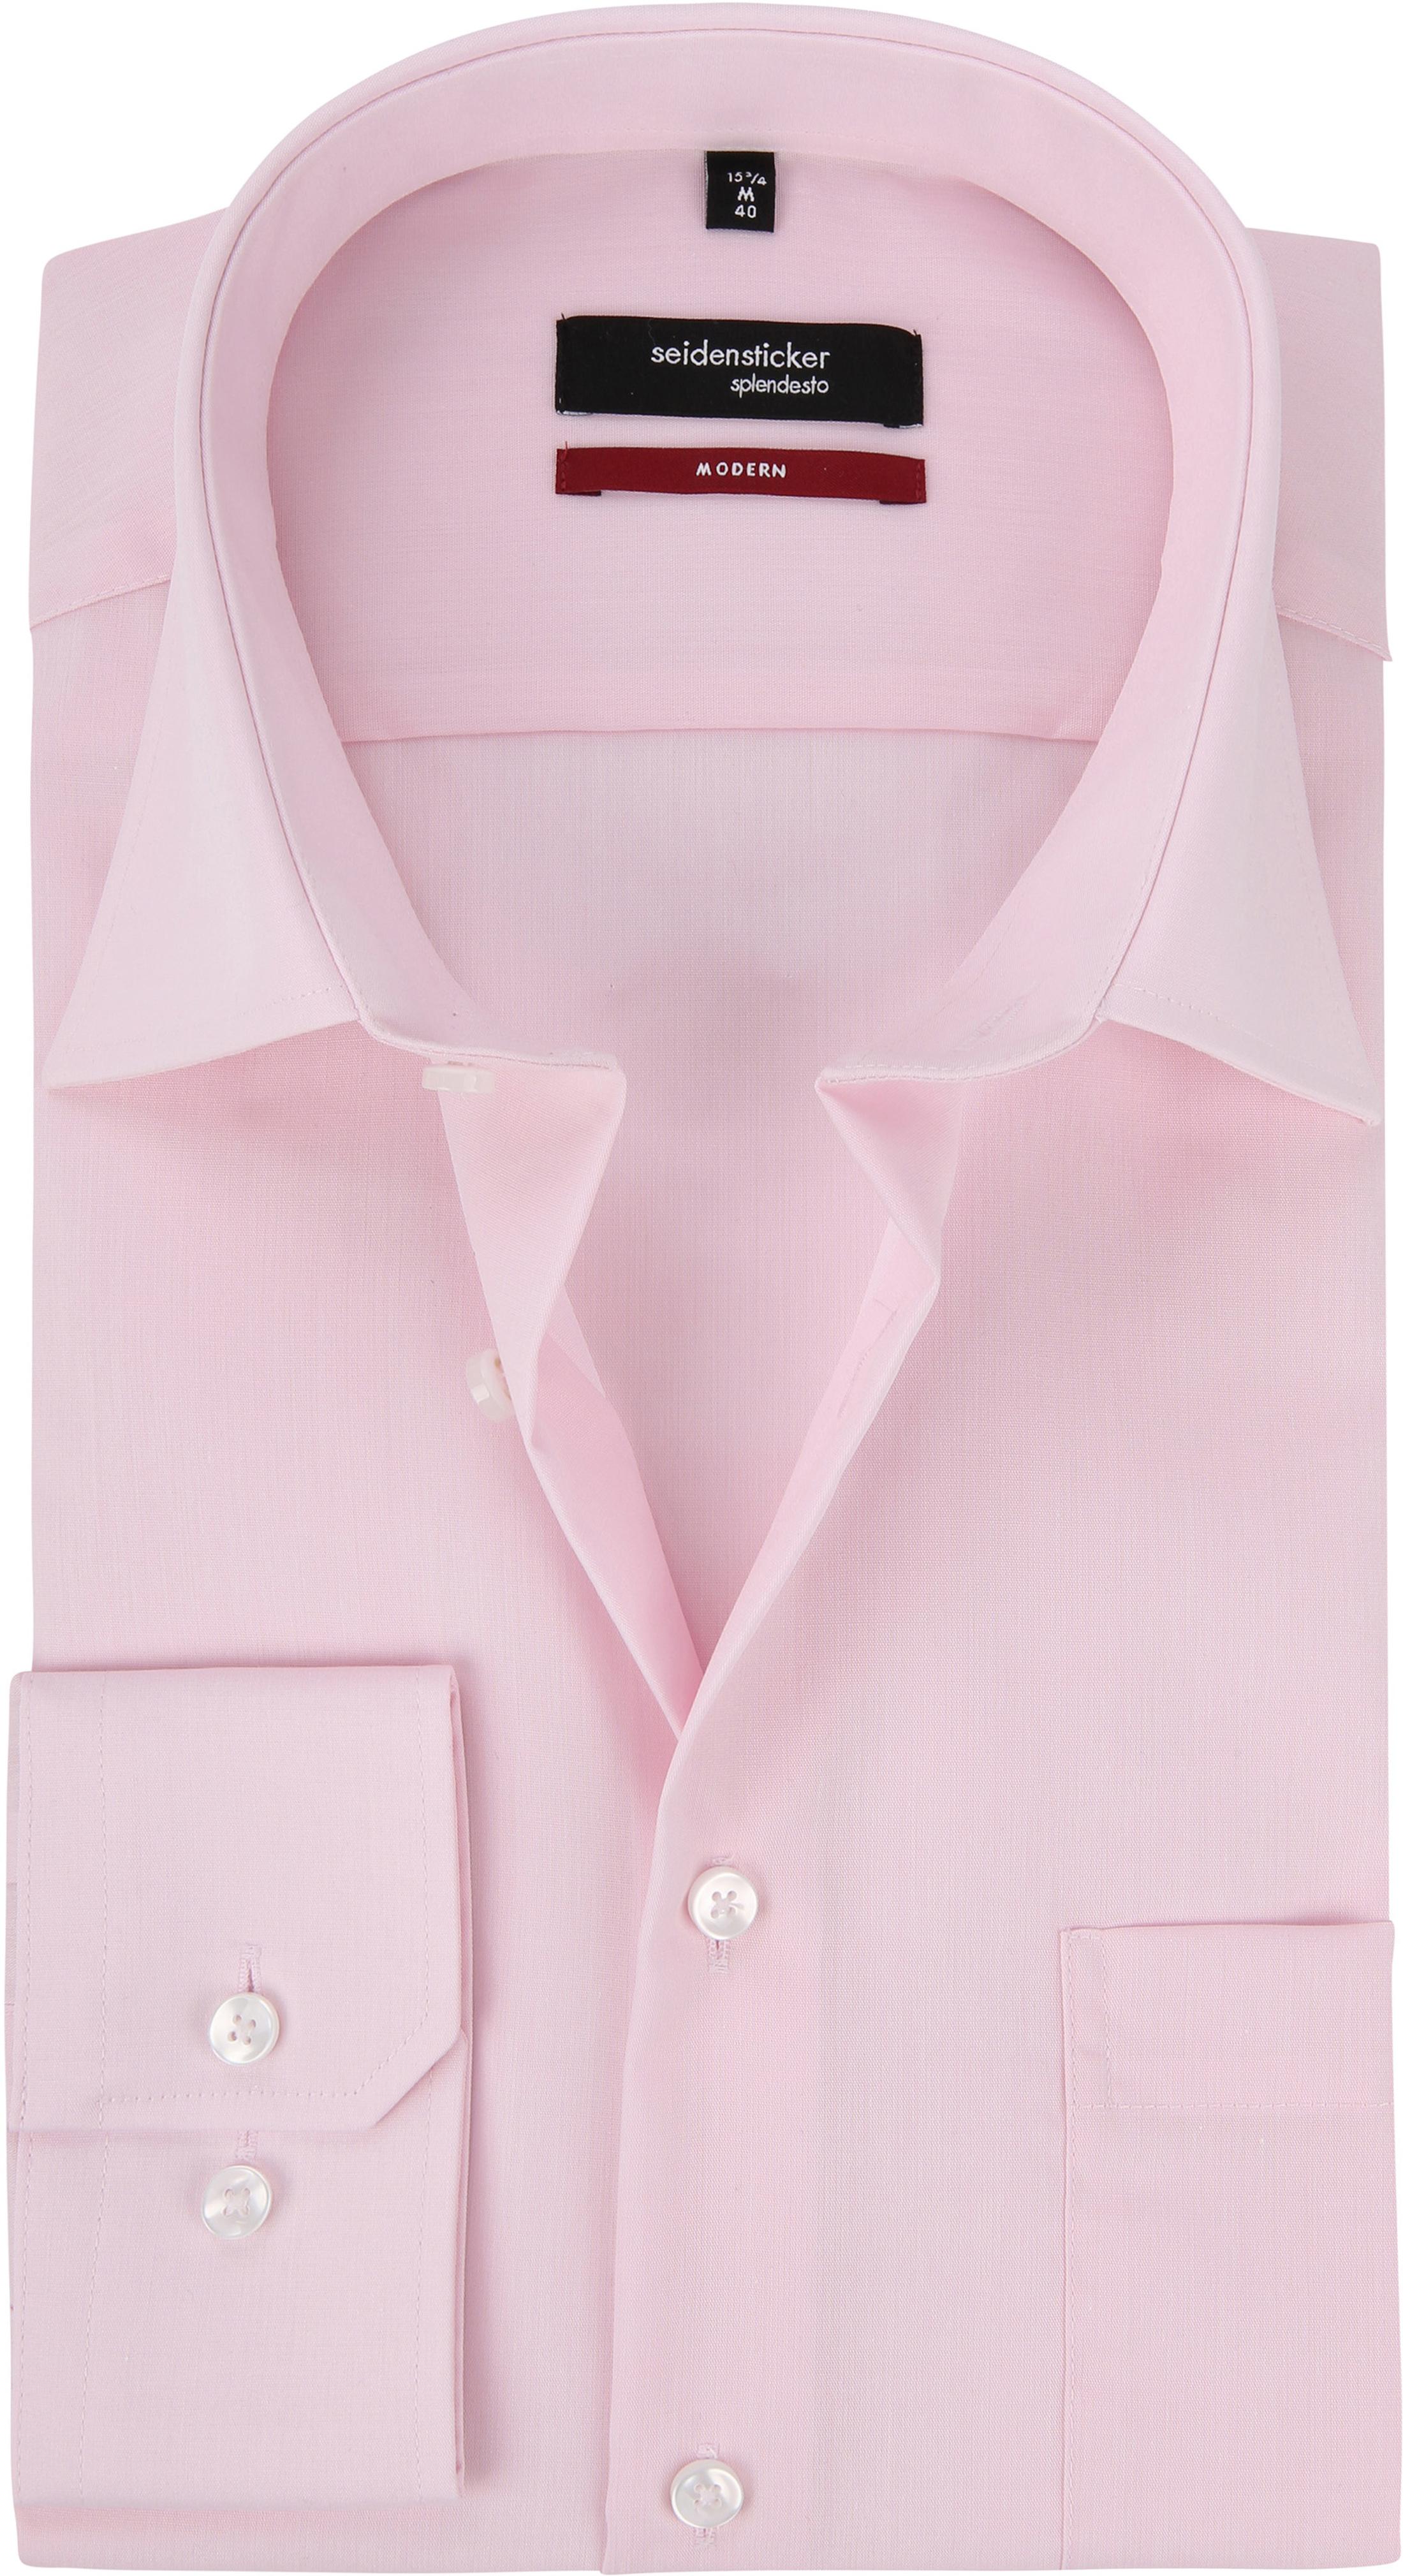 Seidensticker Splendesto Shirt Roze photo 0